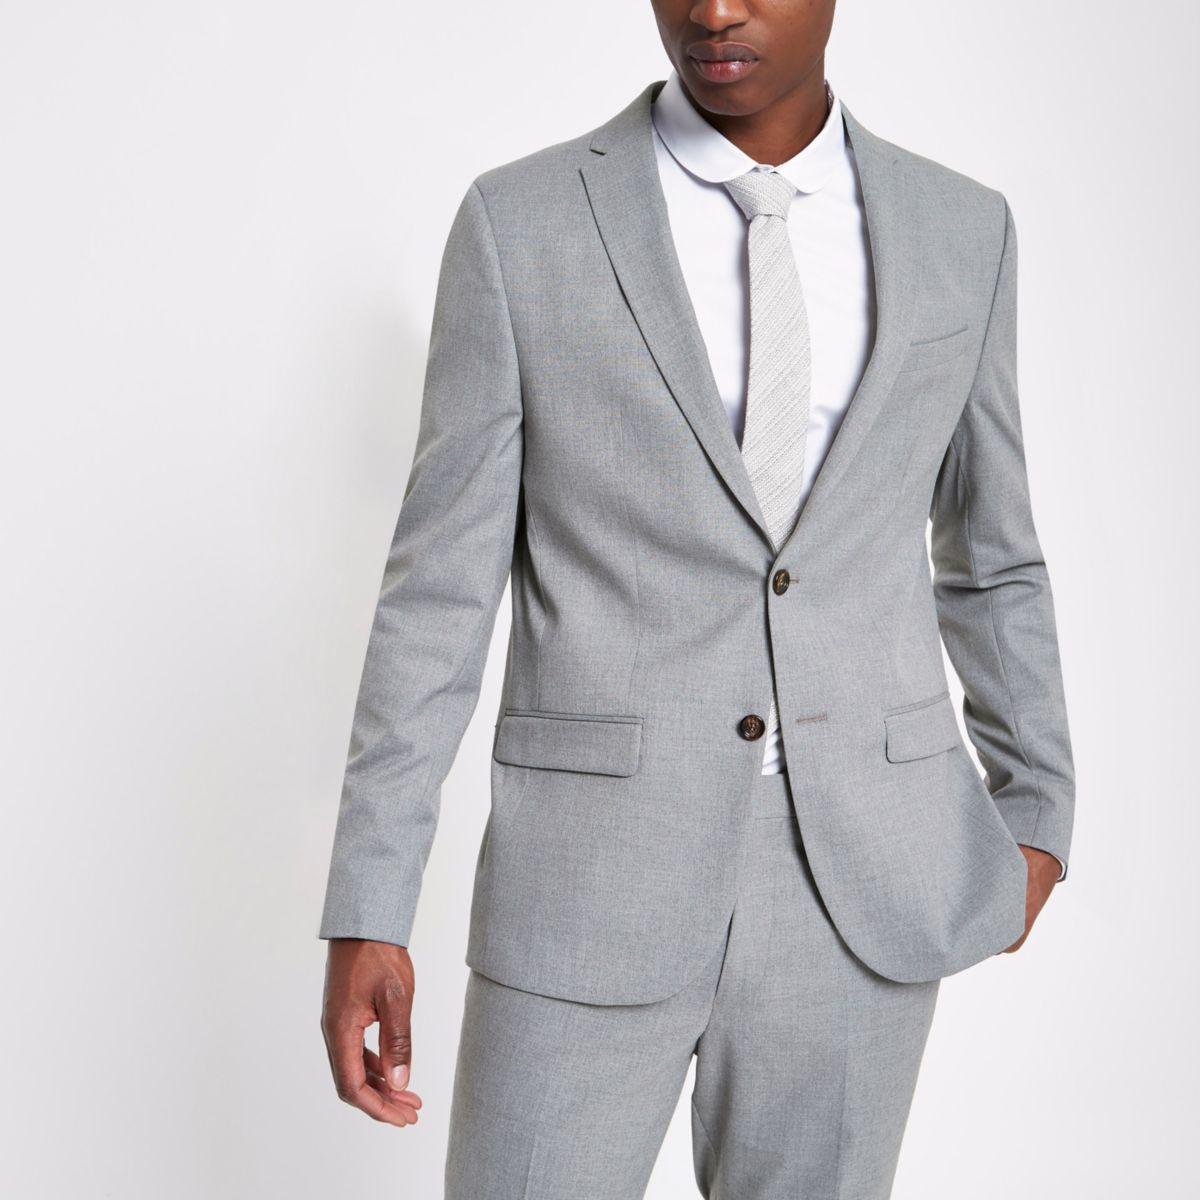 Veste de costume grise coupe cintrée